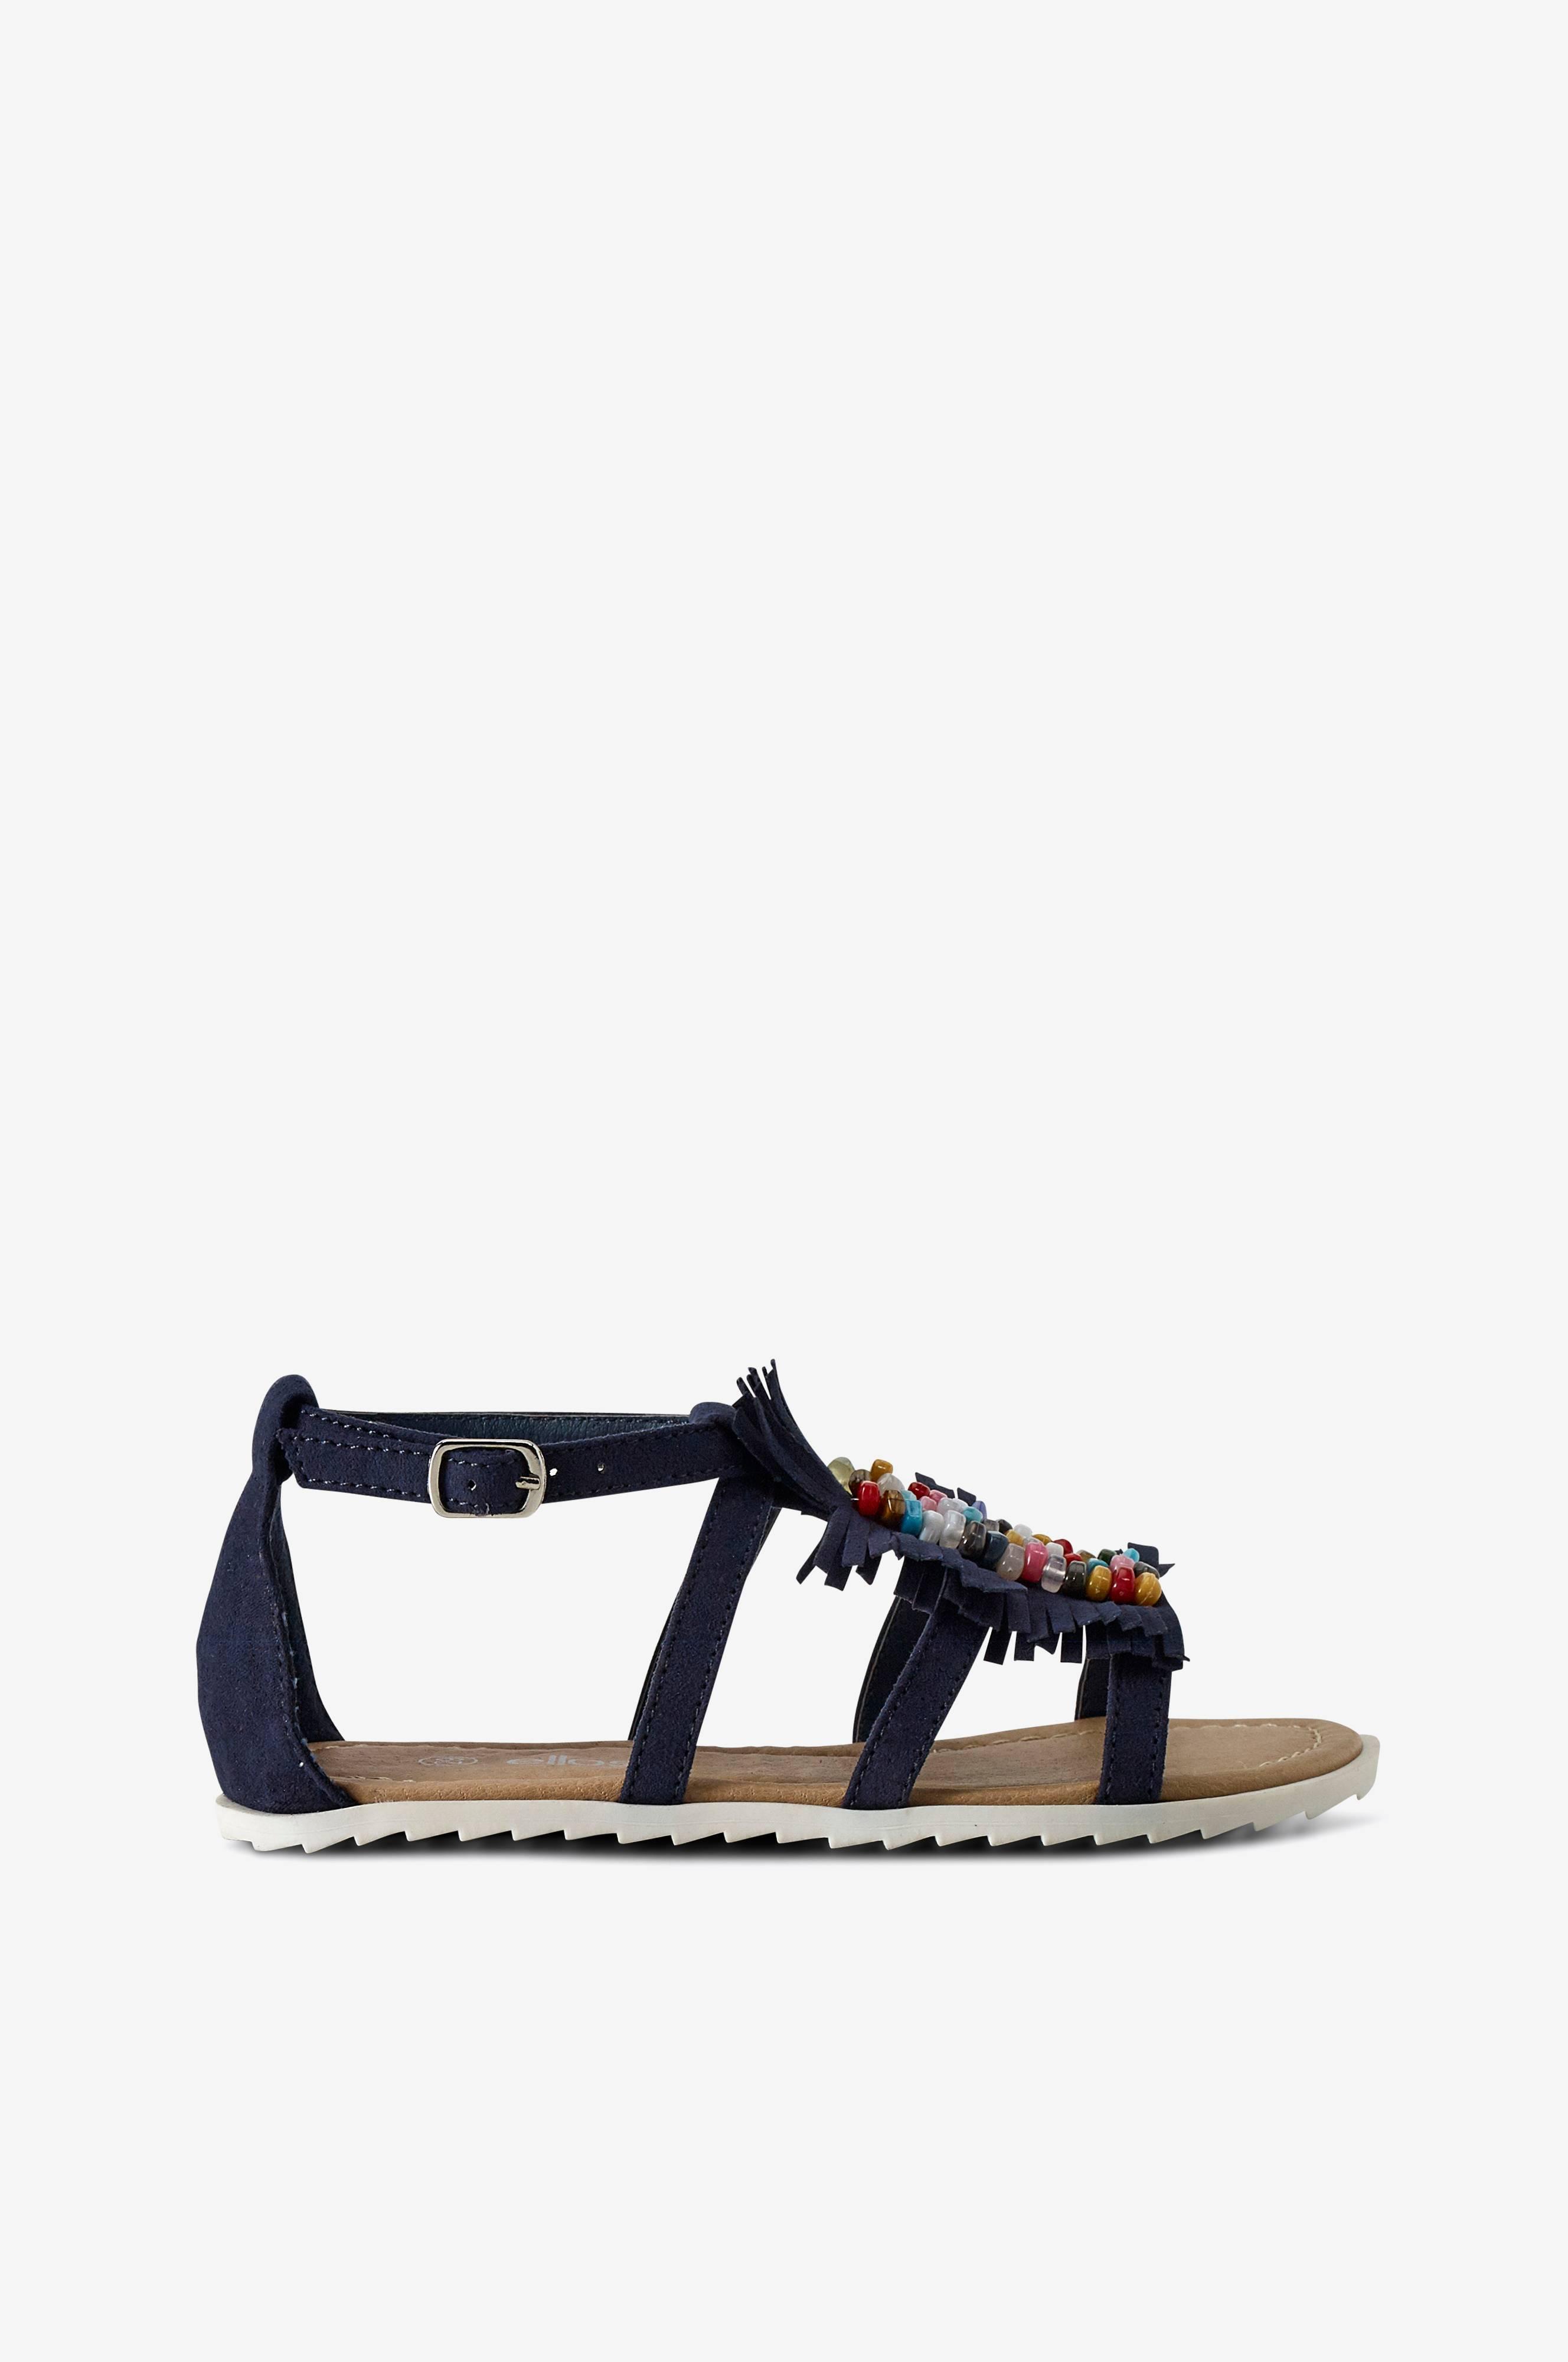 Find every shop in the world selling sandaler og slippers at